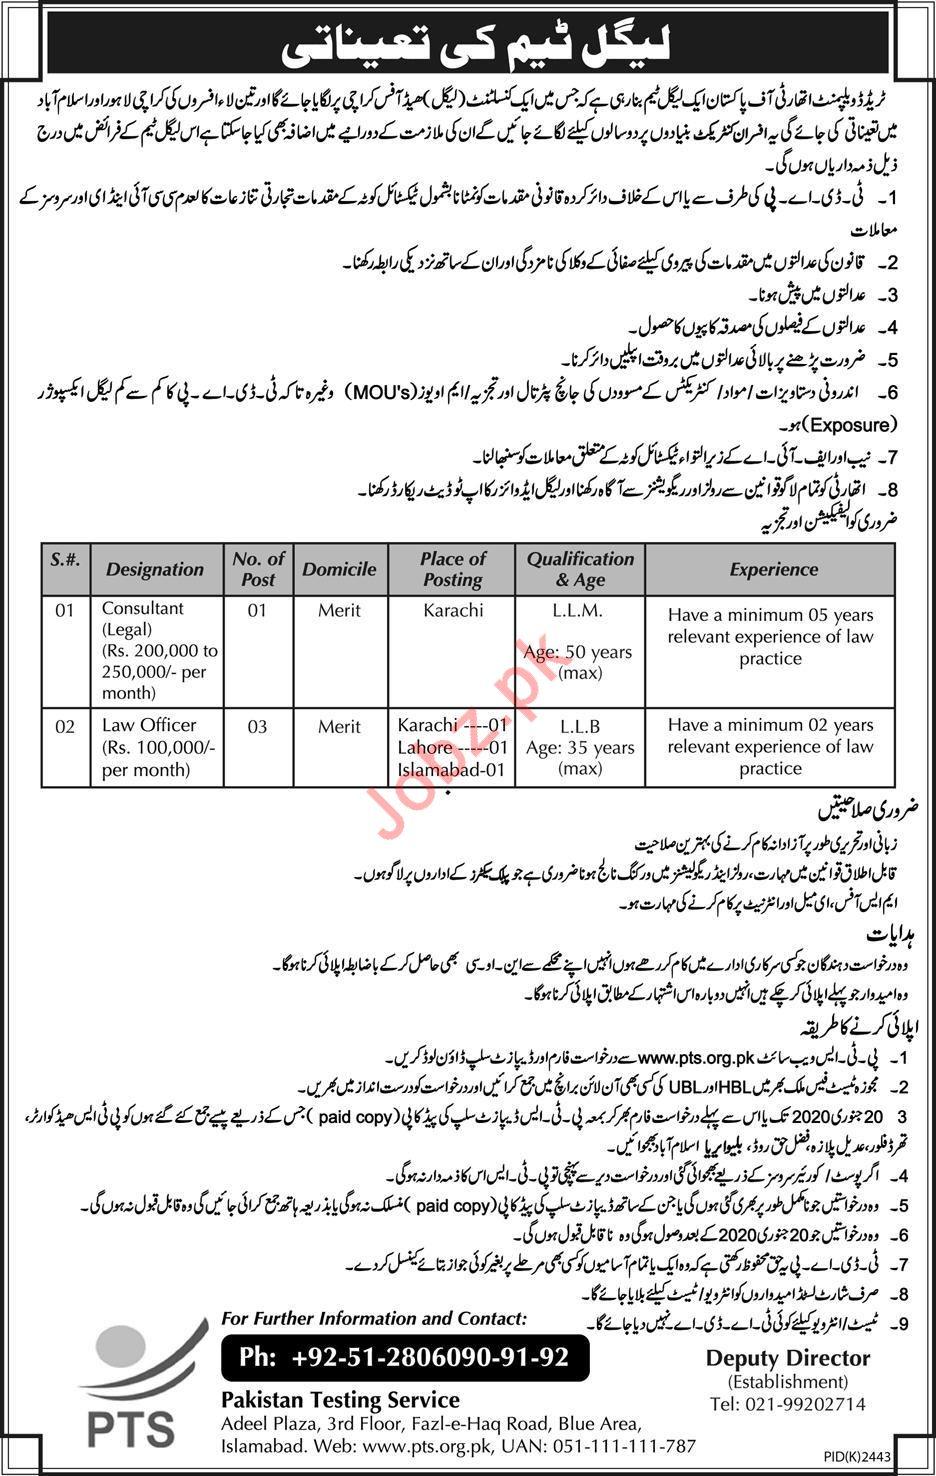 Trade Development Authority of Pakistan TDAP Via PTS